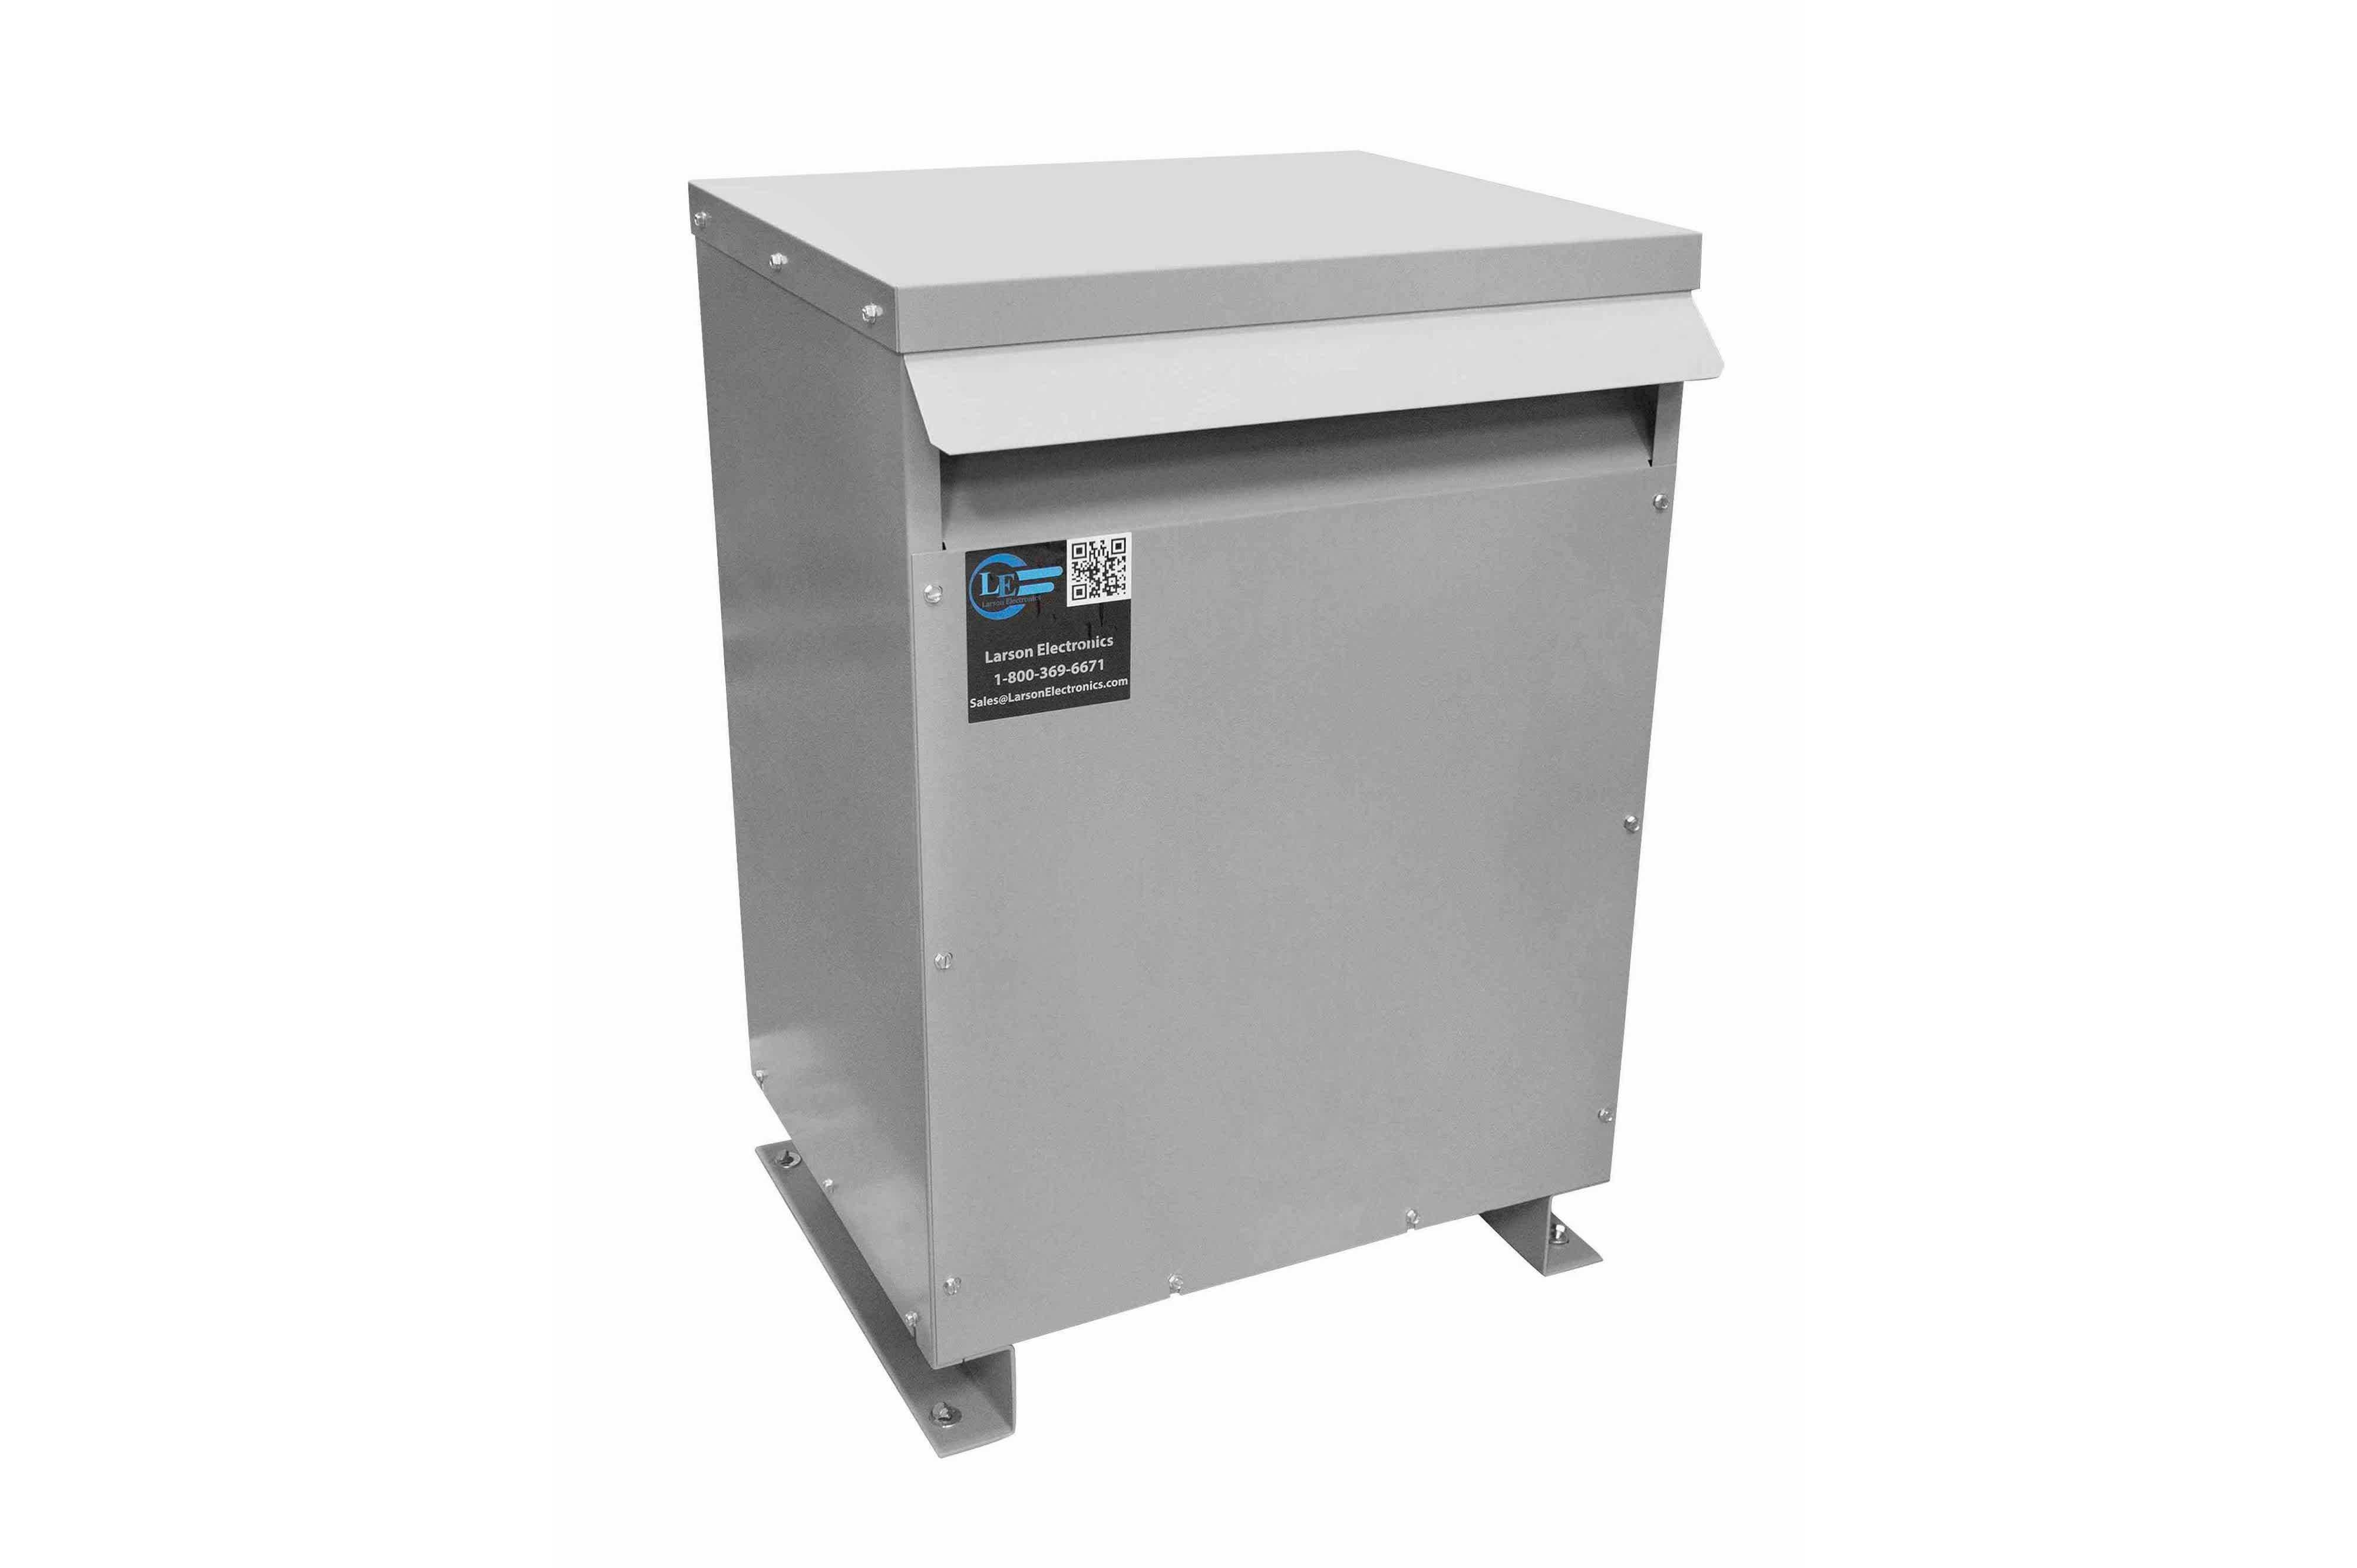 28 kVA 3PH DOE Transformer, 208V Delta Primary, 415Y/240 Wye-N Secondary, N3R, Ventilated, 60 Hz